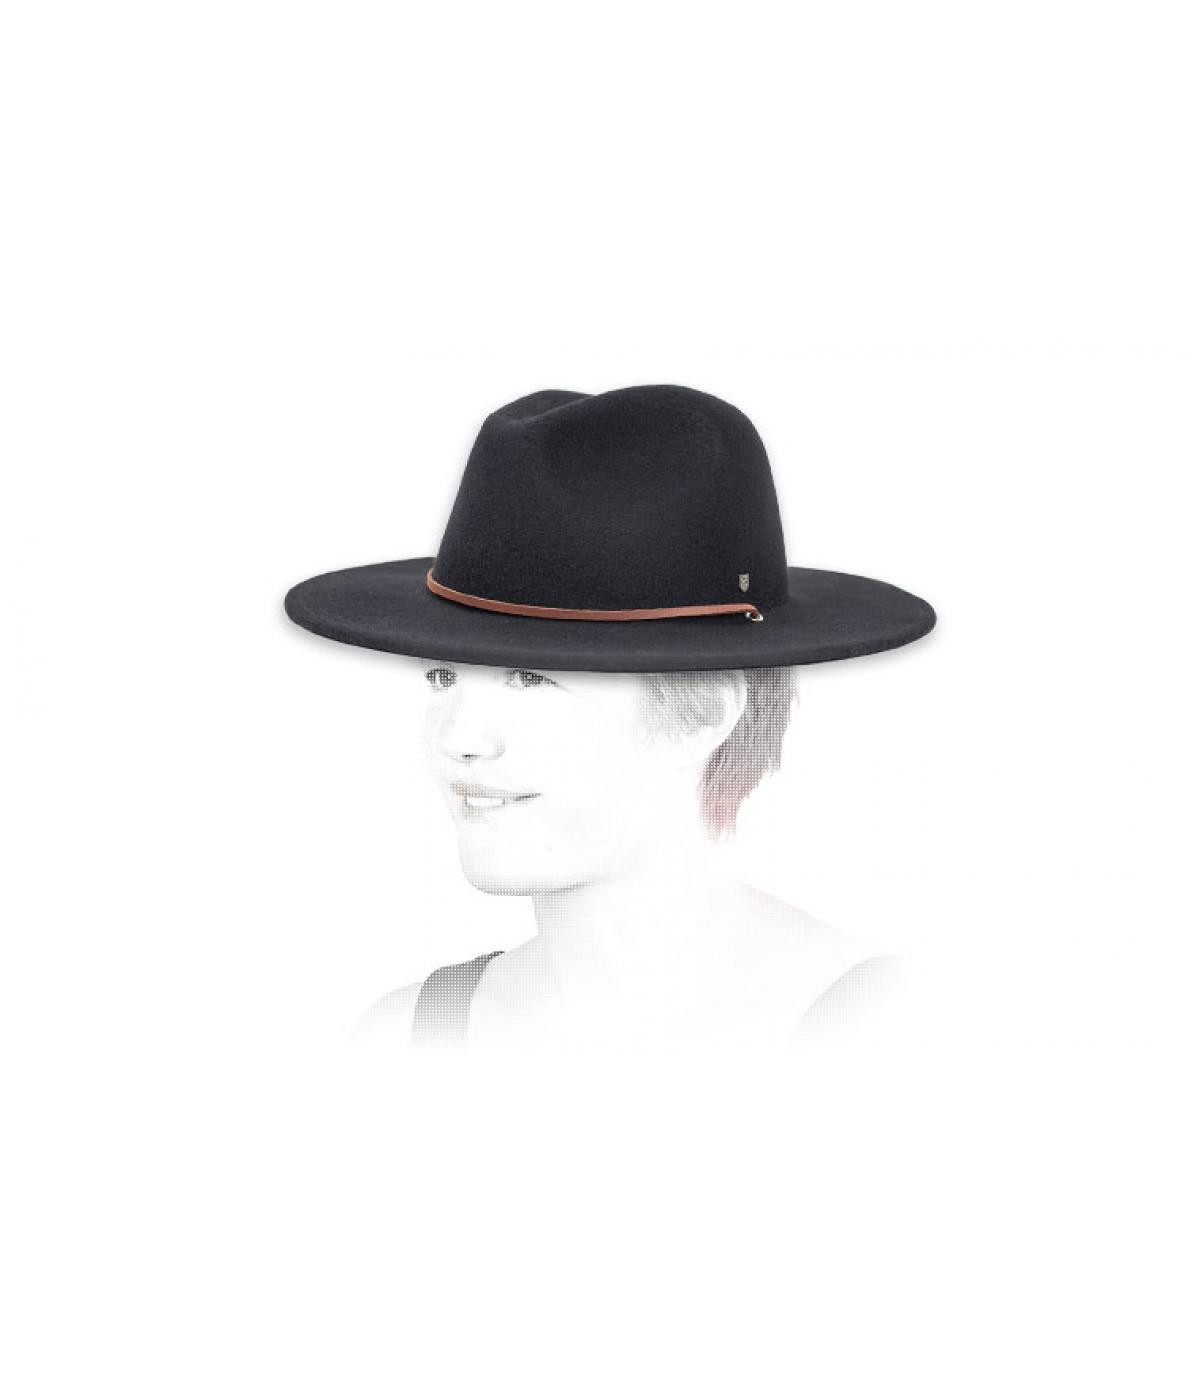 Zwarte fedora hoed